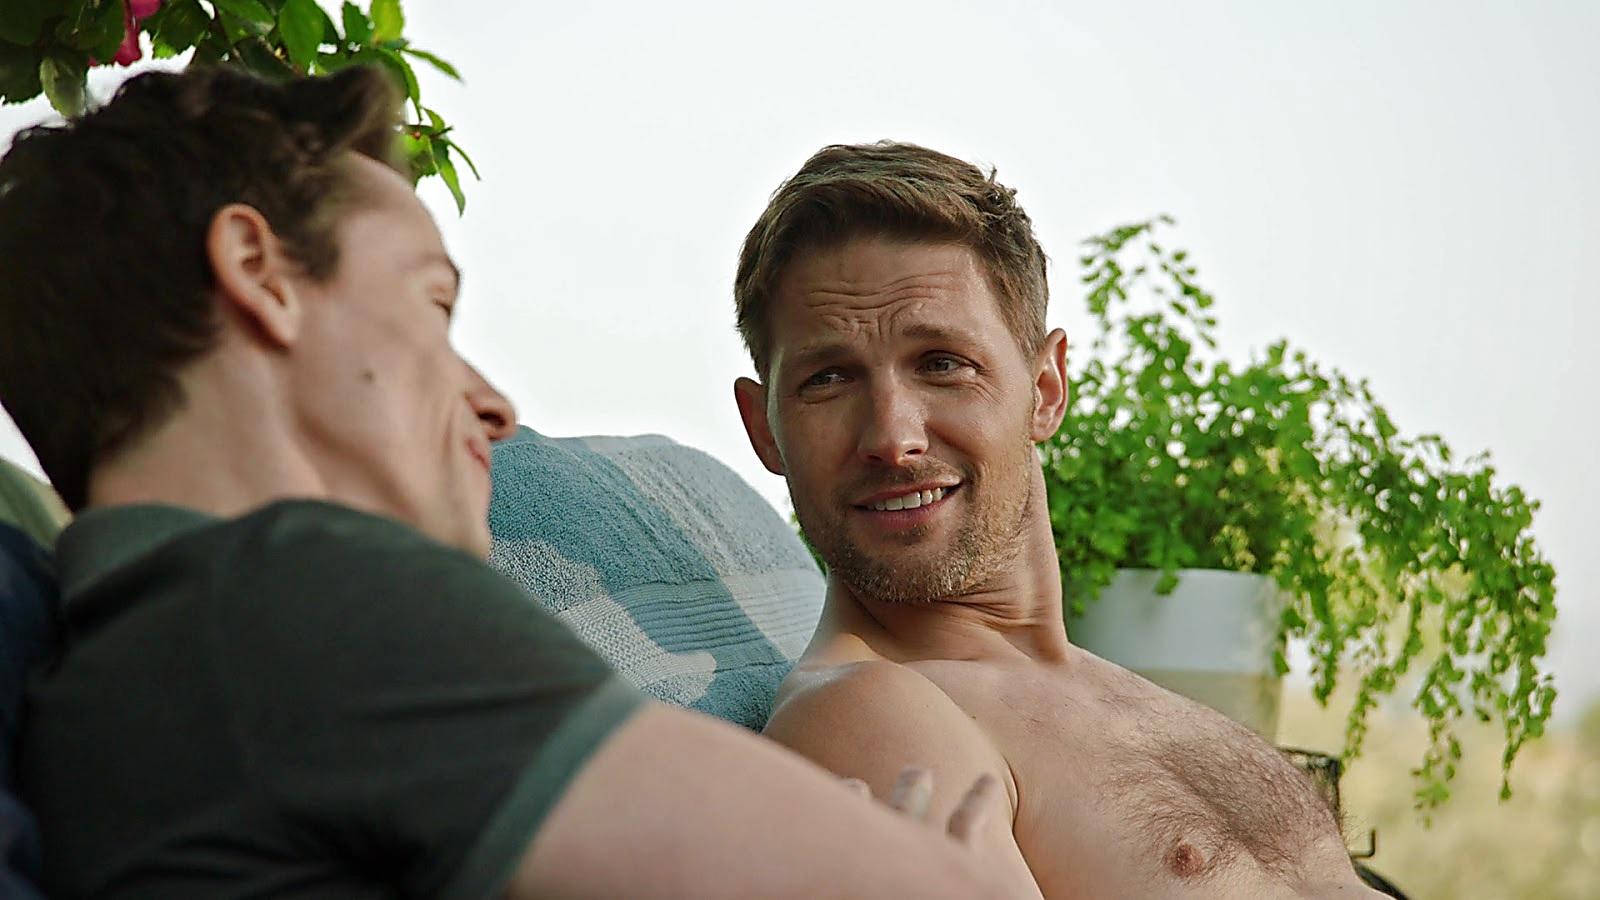 Michael Cassidy sexy shirtless scene June 11, 2020, 11am